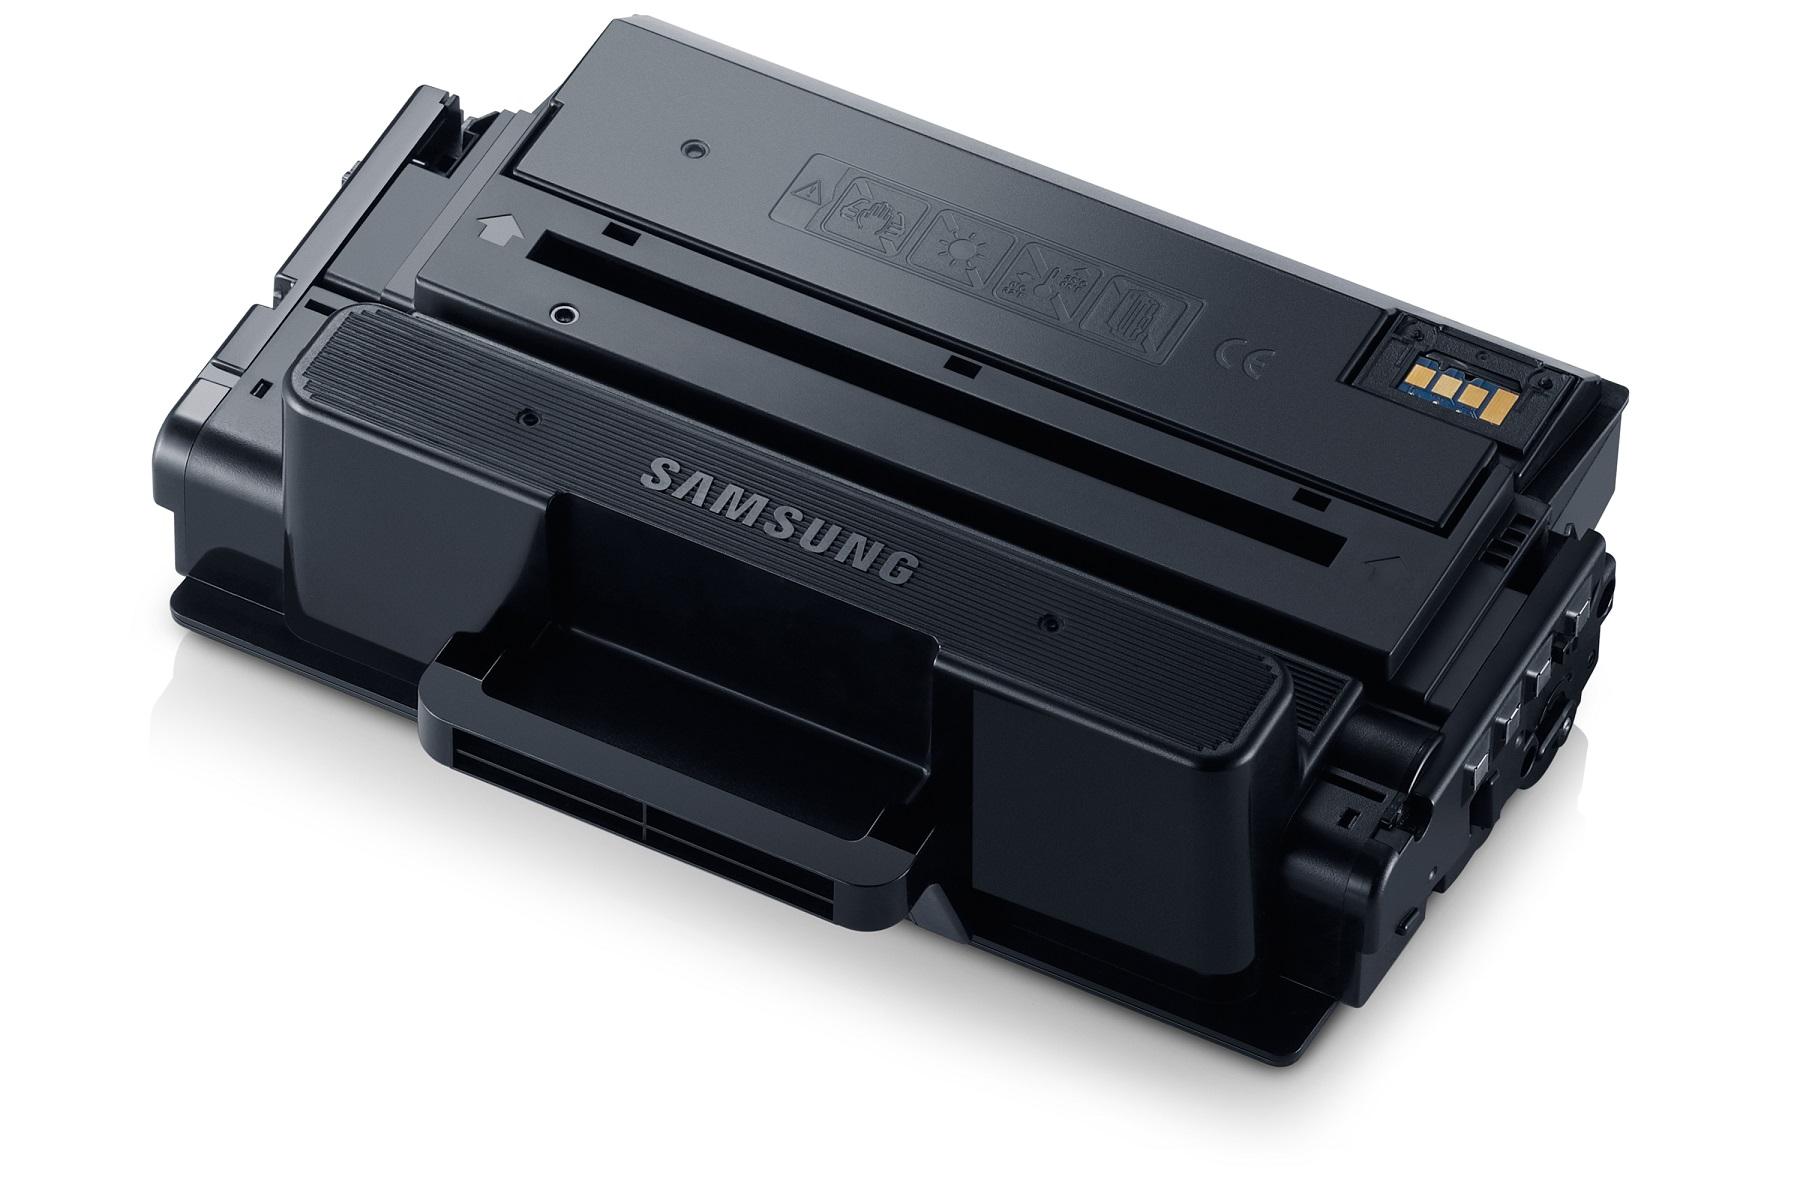 Samsung toner černý MLT - D203L pro M3320/3370/3820/3870/4020/4070 - 5000 str.